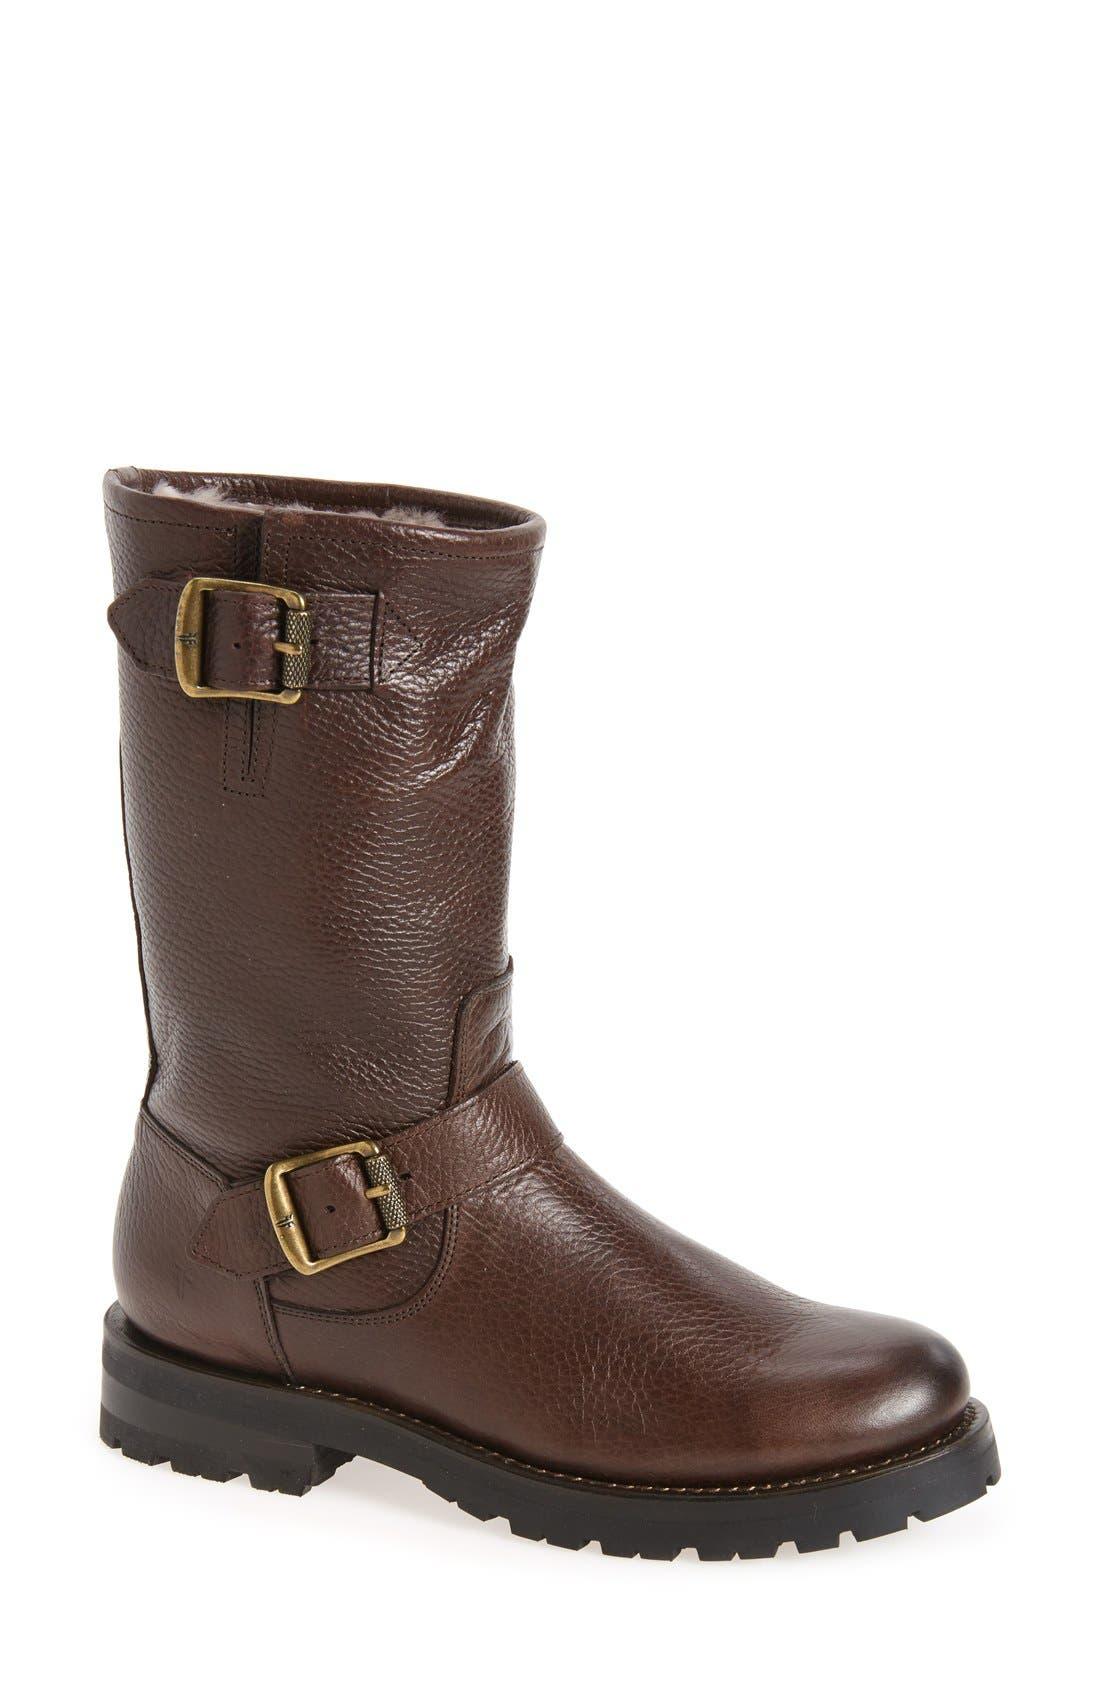 Frye Natalie Buckle Strap Engineer Genuine Shearling Lined Boot (Women)